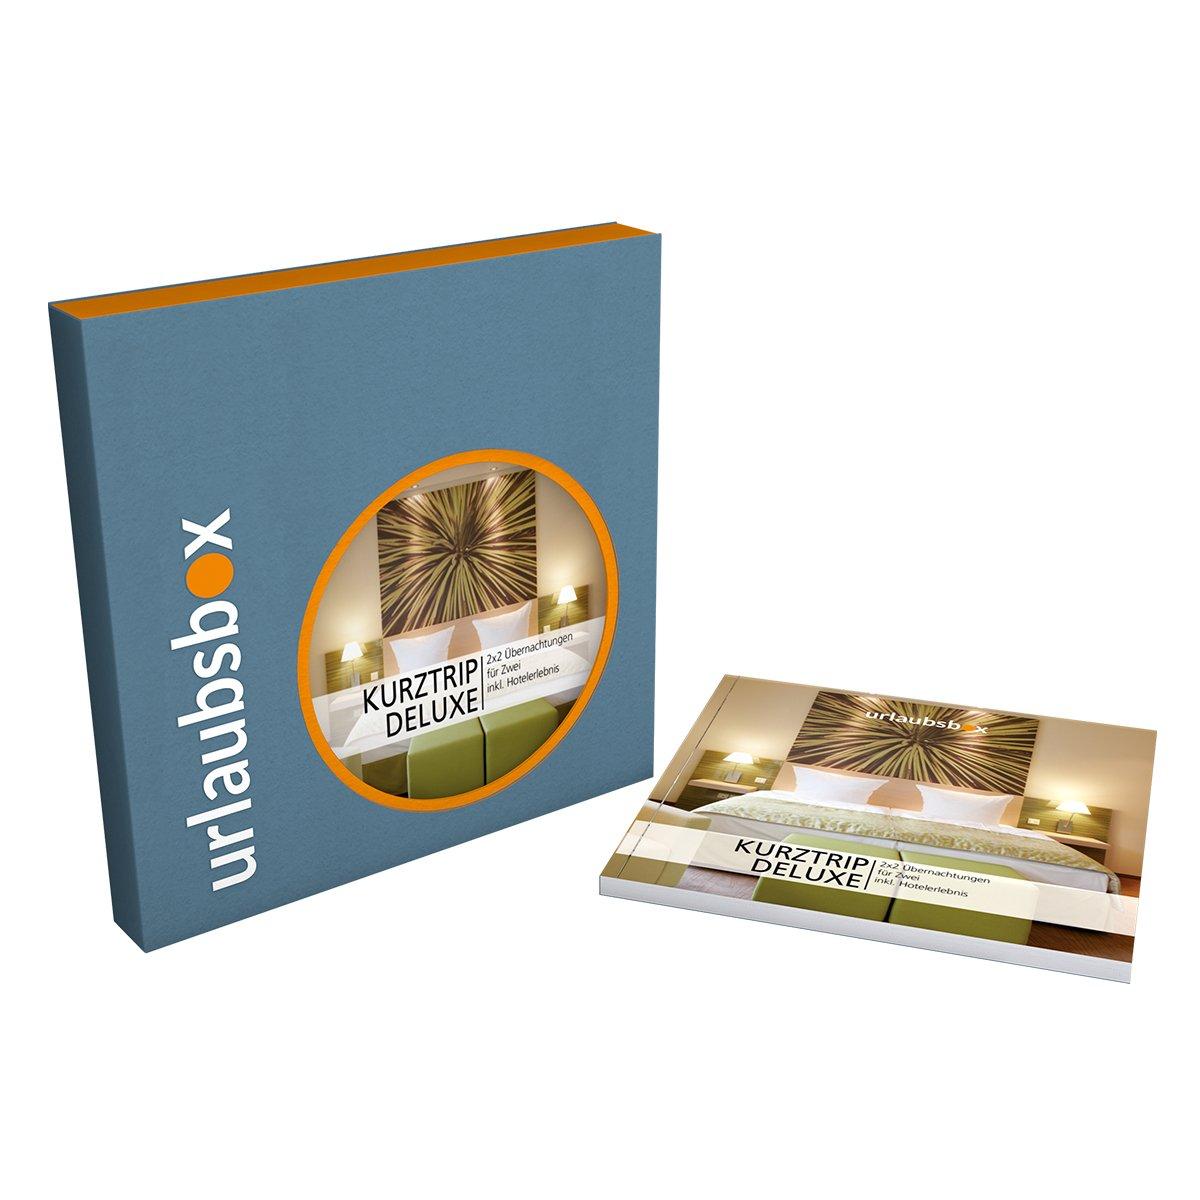 Kurztrip Deluxe - Hotelgutschein - 3